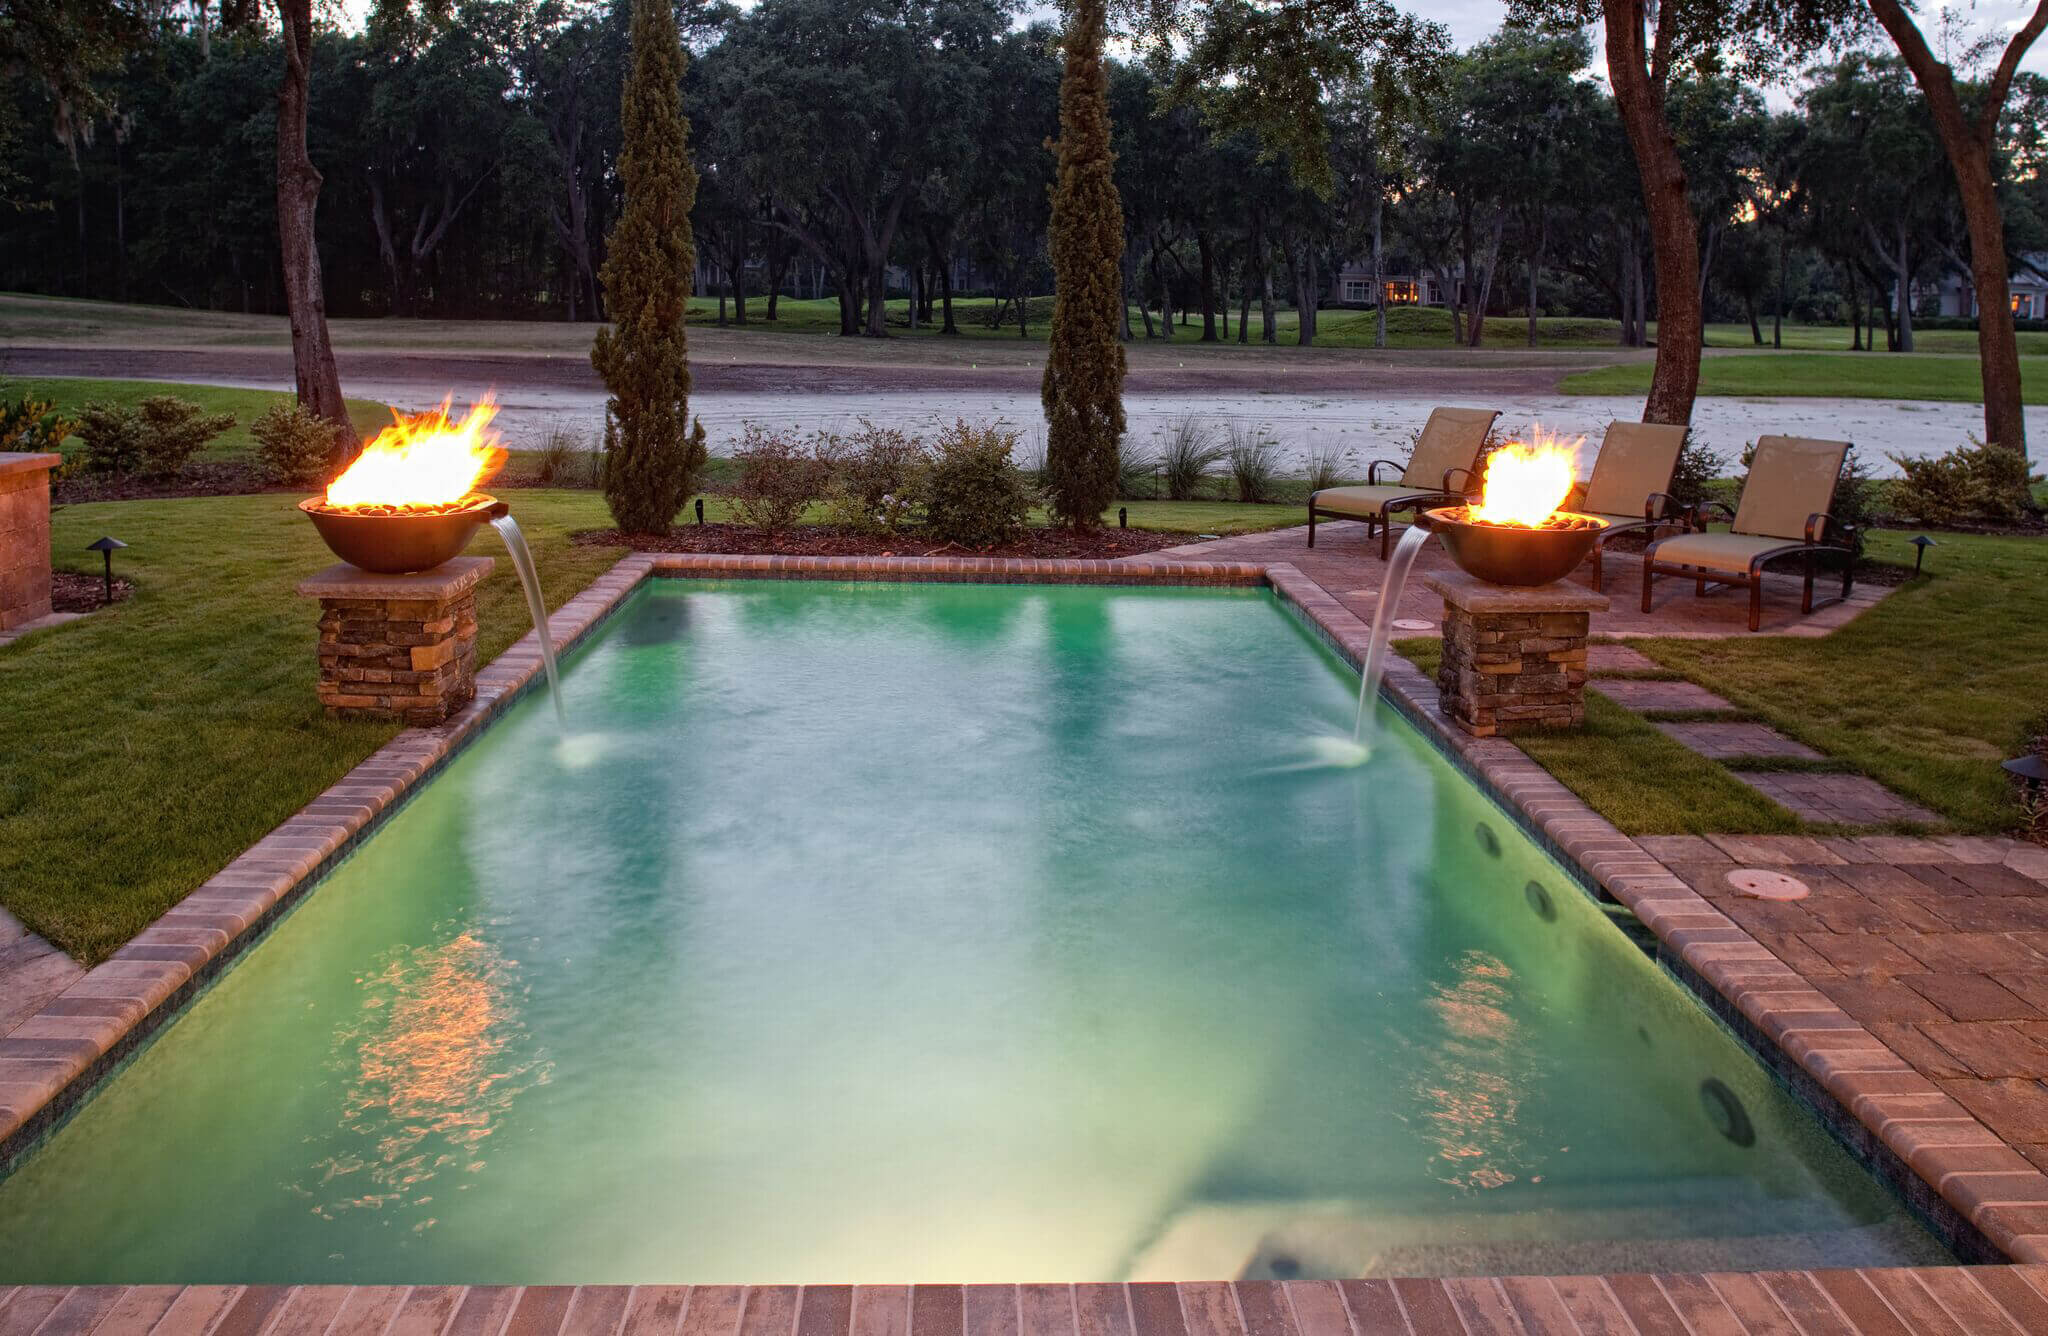 Backyard Pool Deck Designs - Hilton Head Island, SC